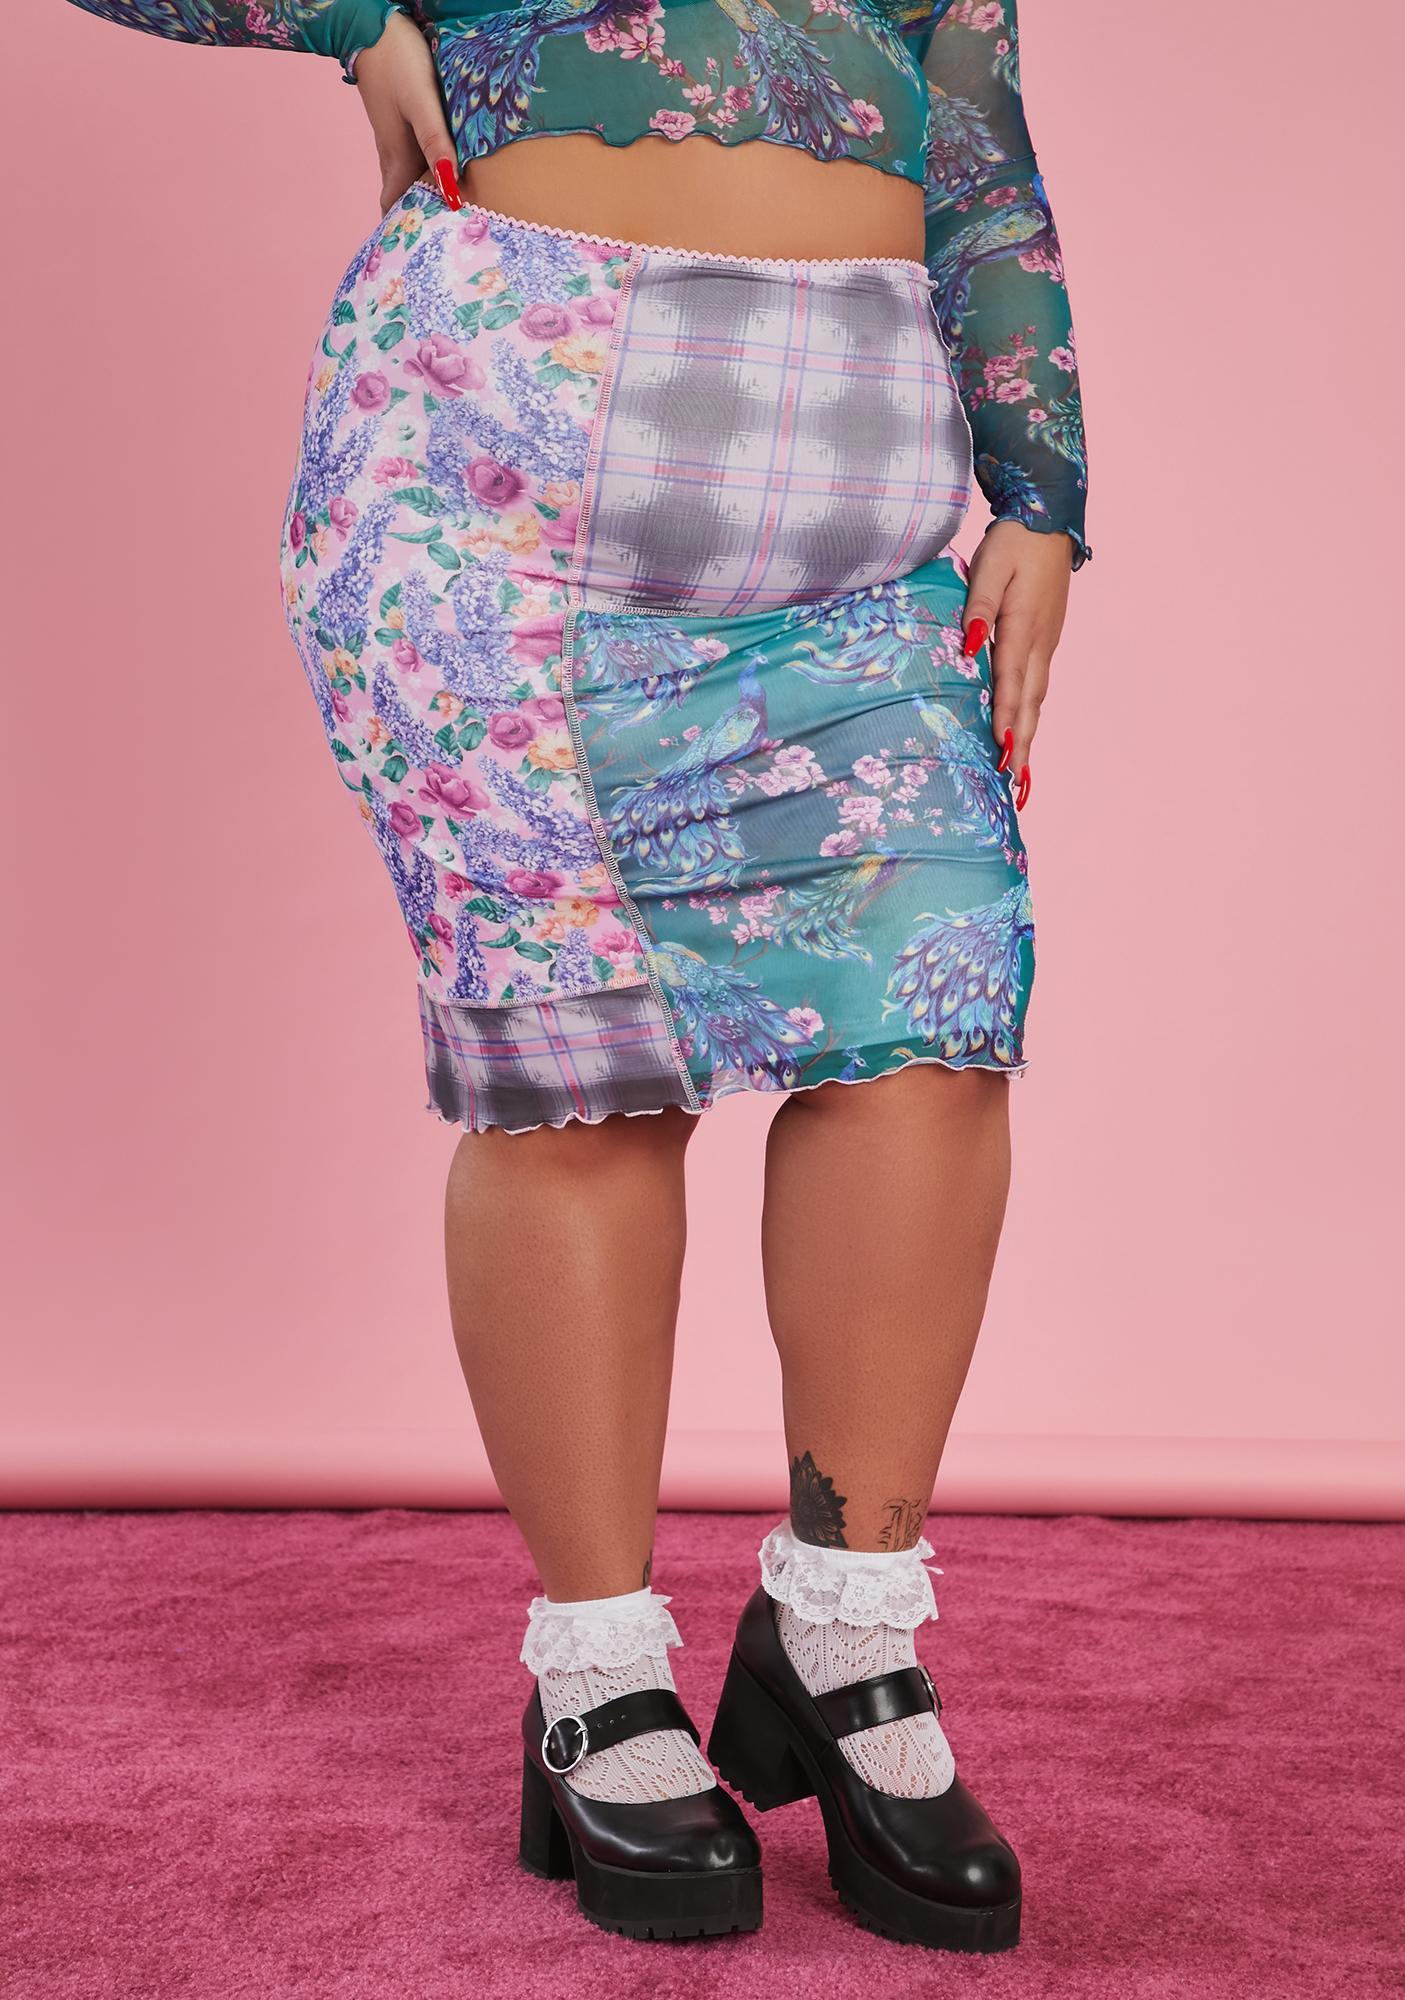 Sugar Thrillz And Sews It Begins Patchwork Skirt